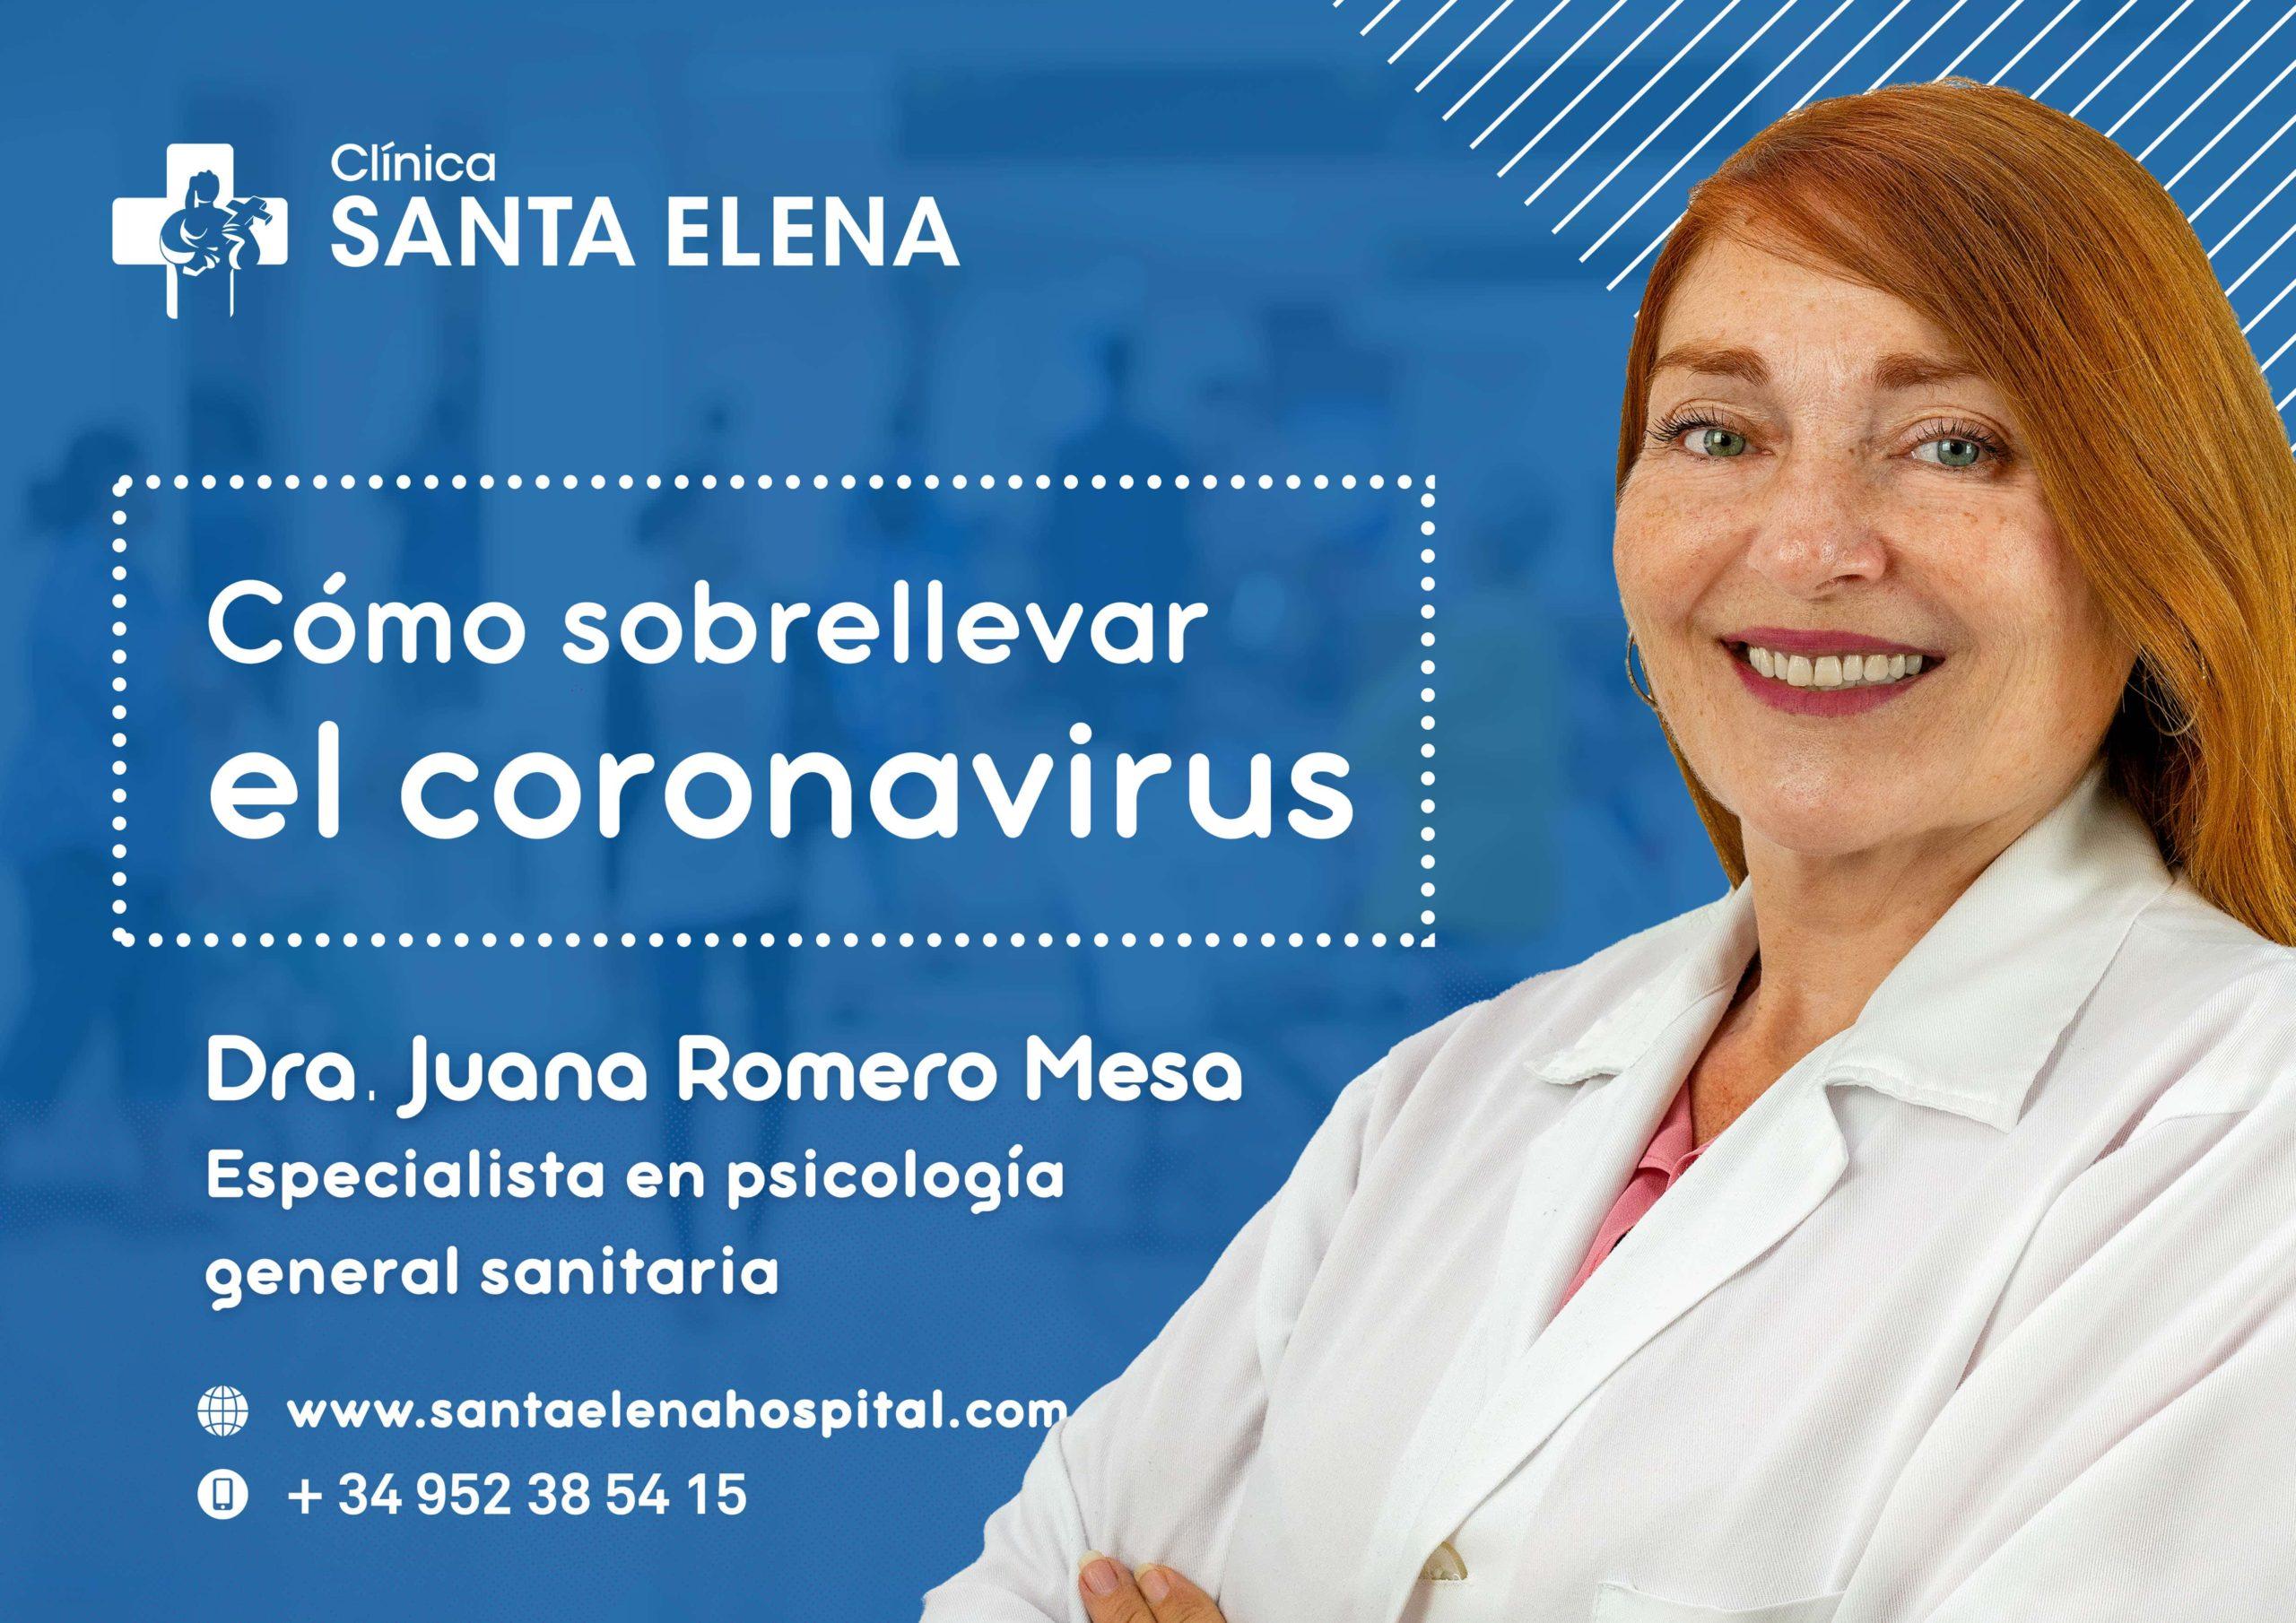 Dra. Juana Romero Mesa Especialista en psicologia general sanitaria